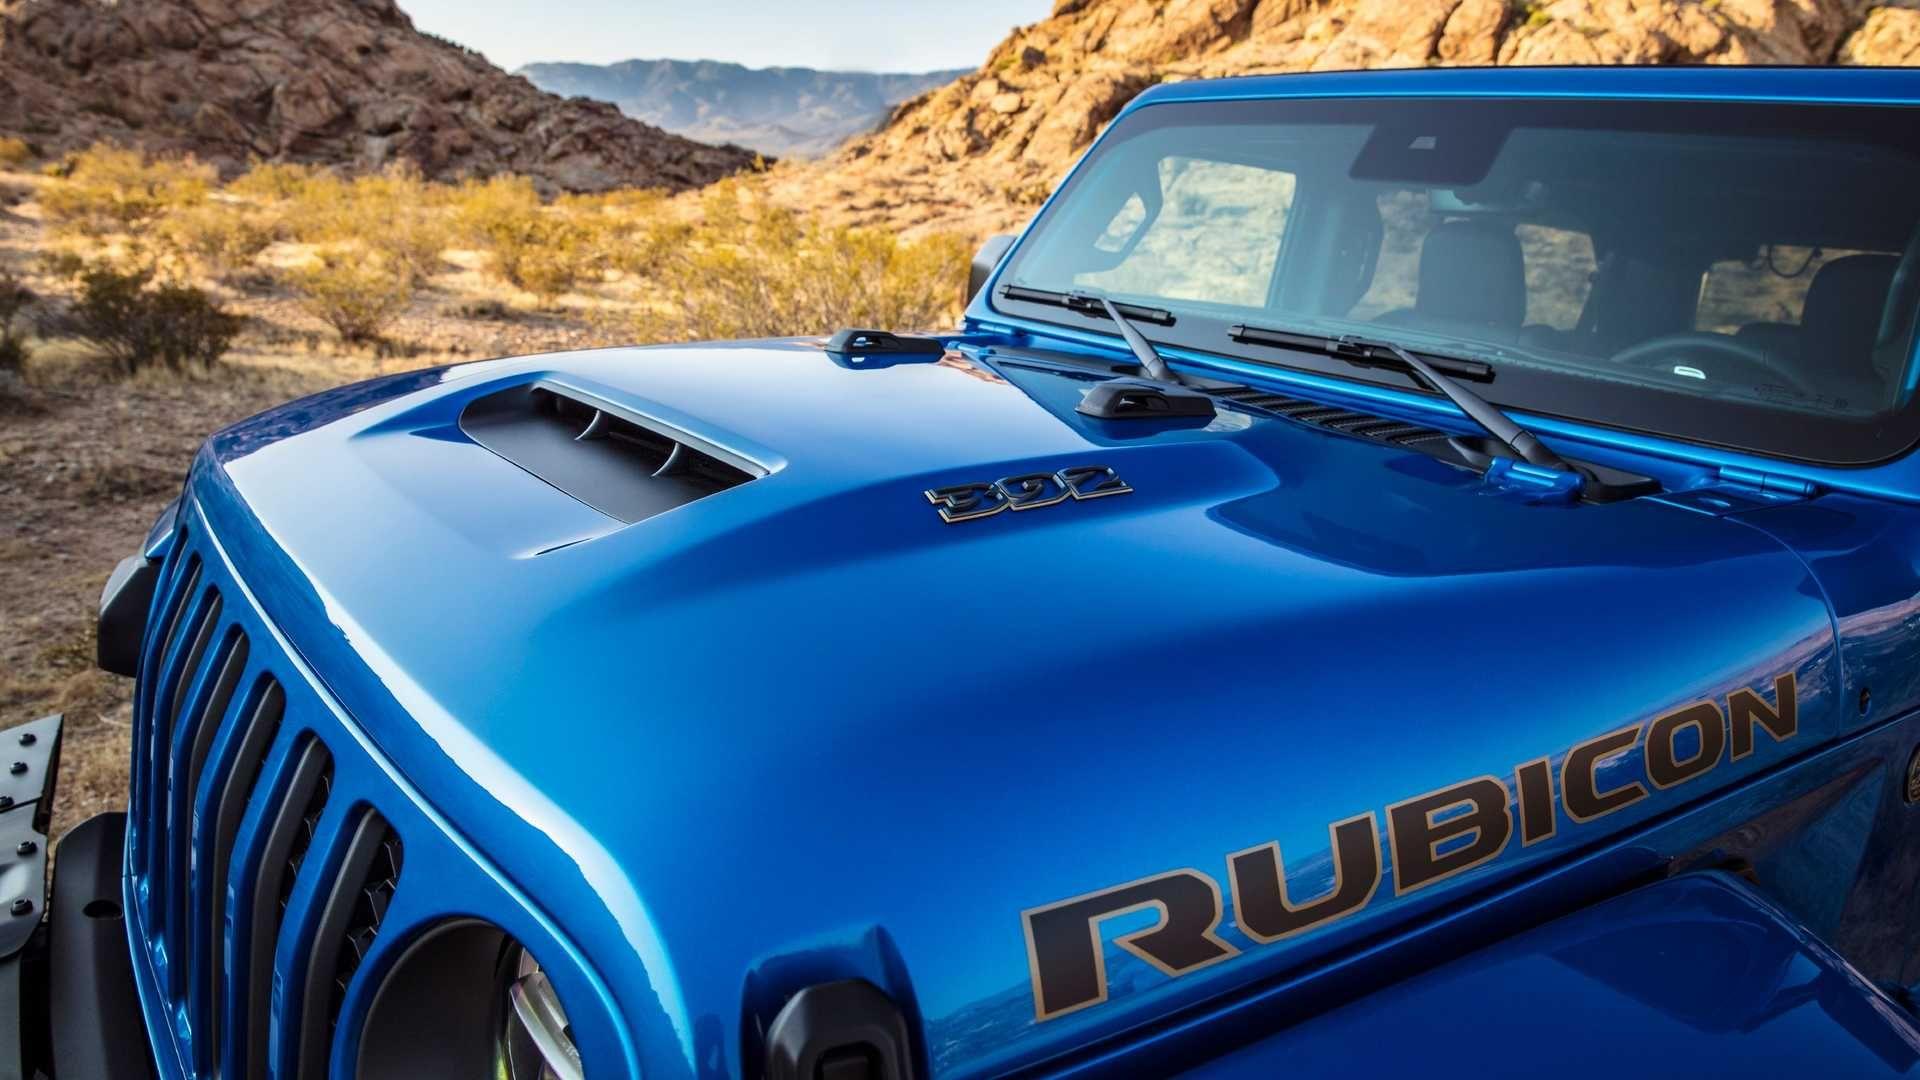 2021 Jeep Wrangler Rubicon 392 Review Jeep Wrangler Rubicon Wrangler Rubicon Jeep Wrangler